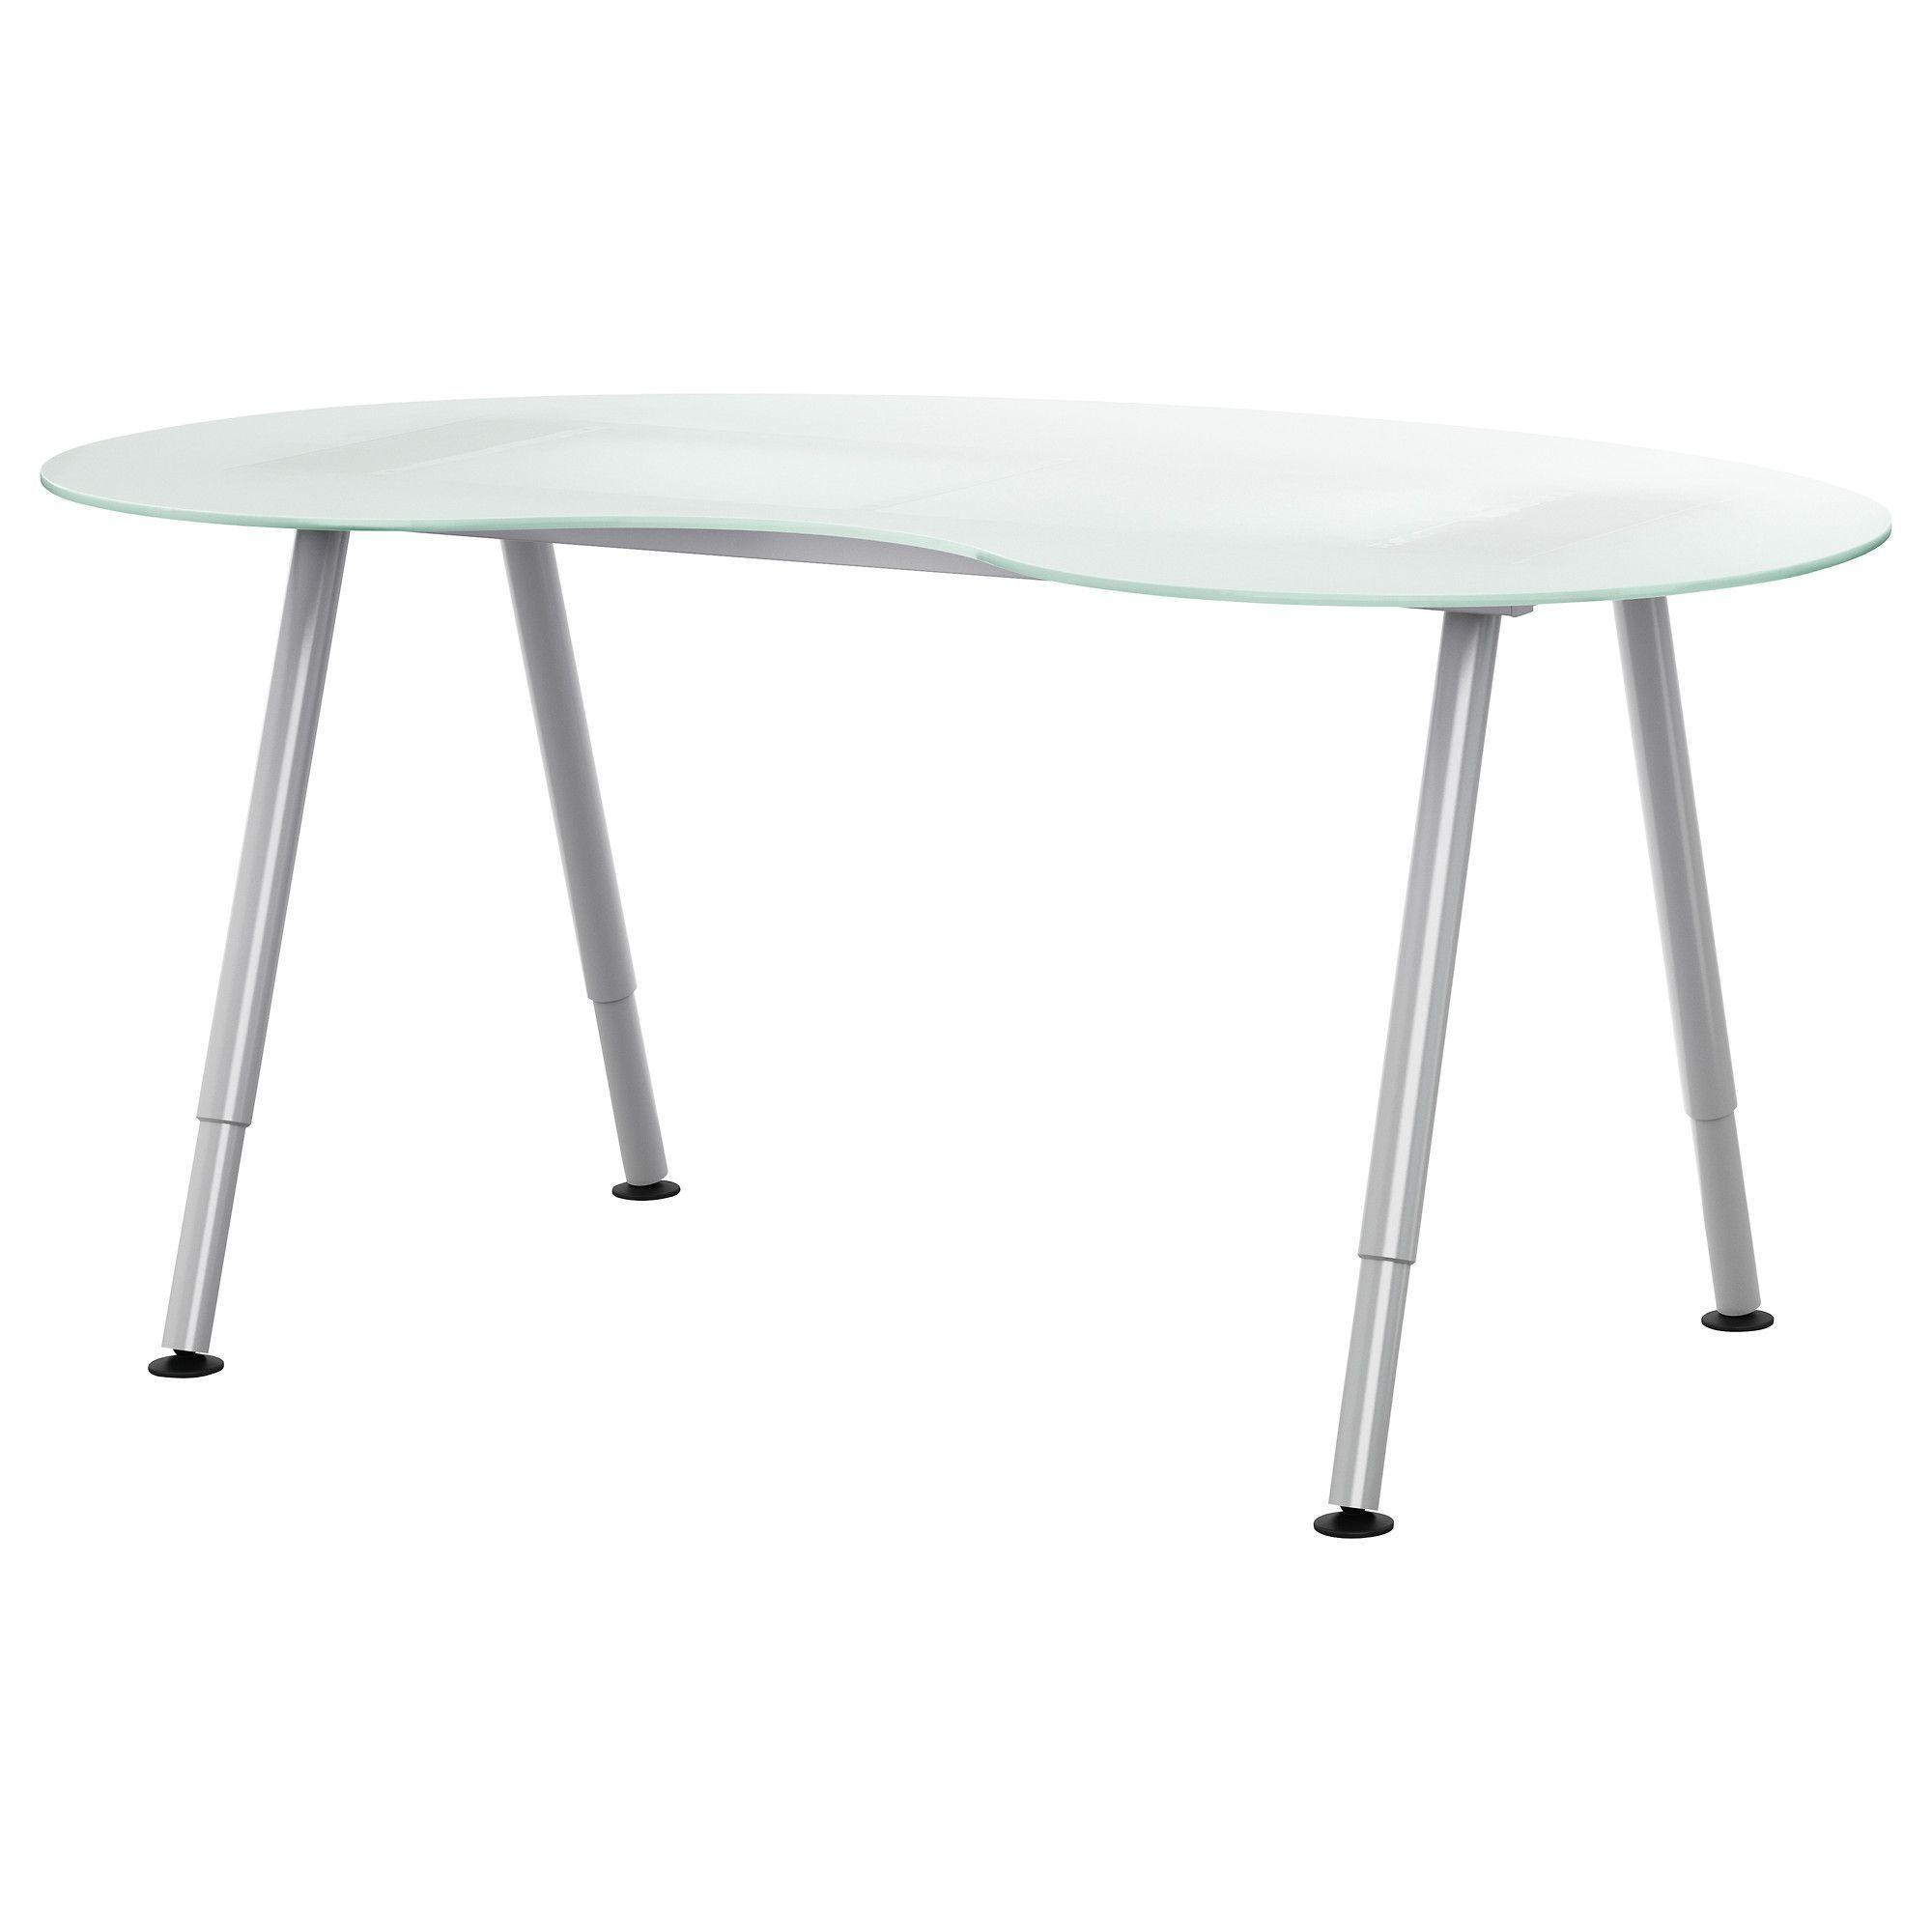 Ikea Galant Office Desk Ikea Glass Desk Ikea Glass Table Office Furniture Design